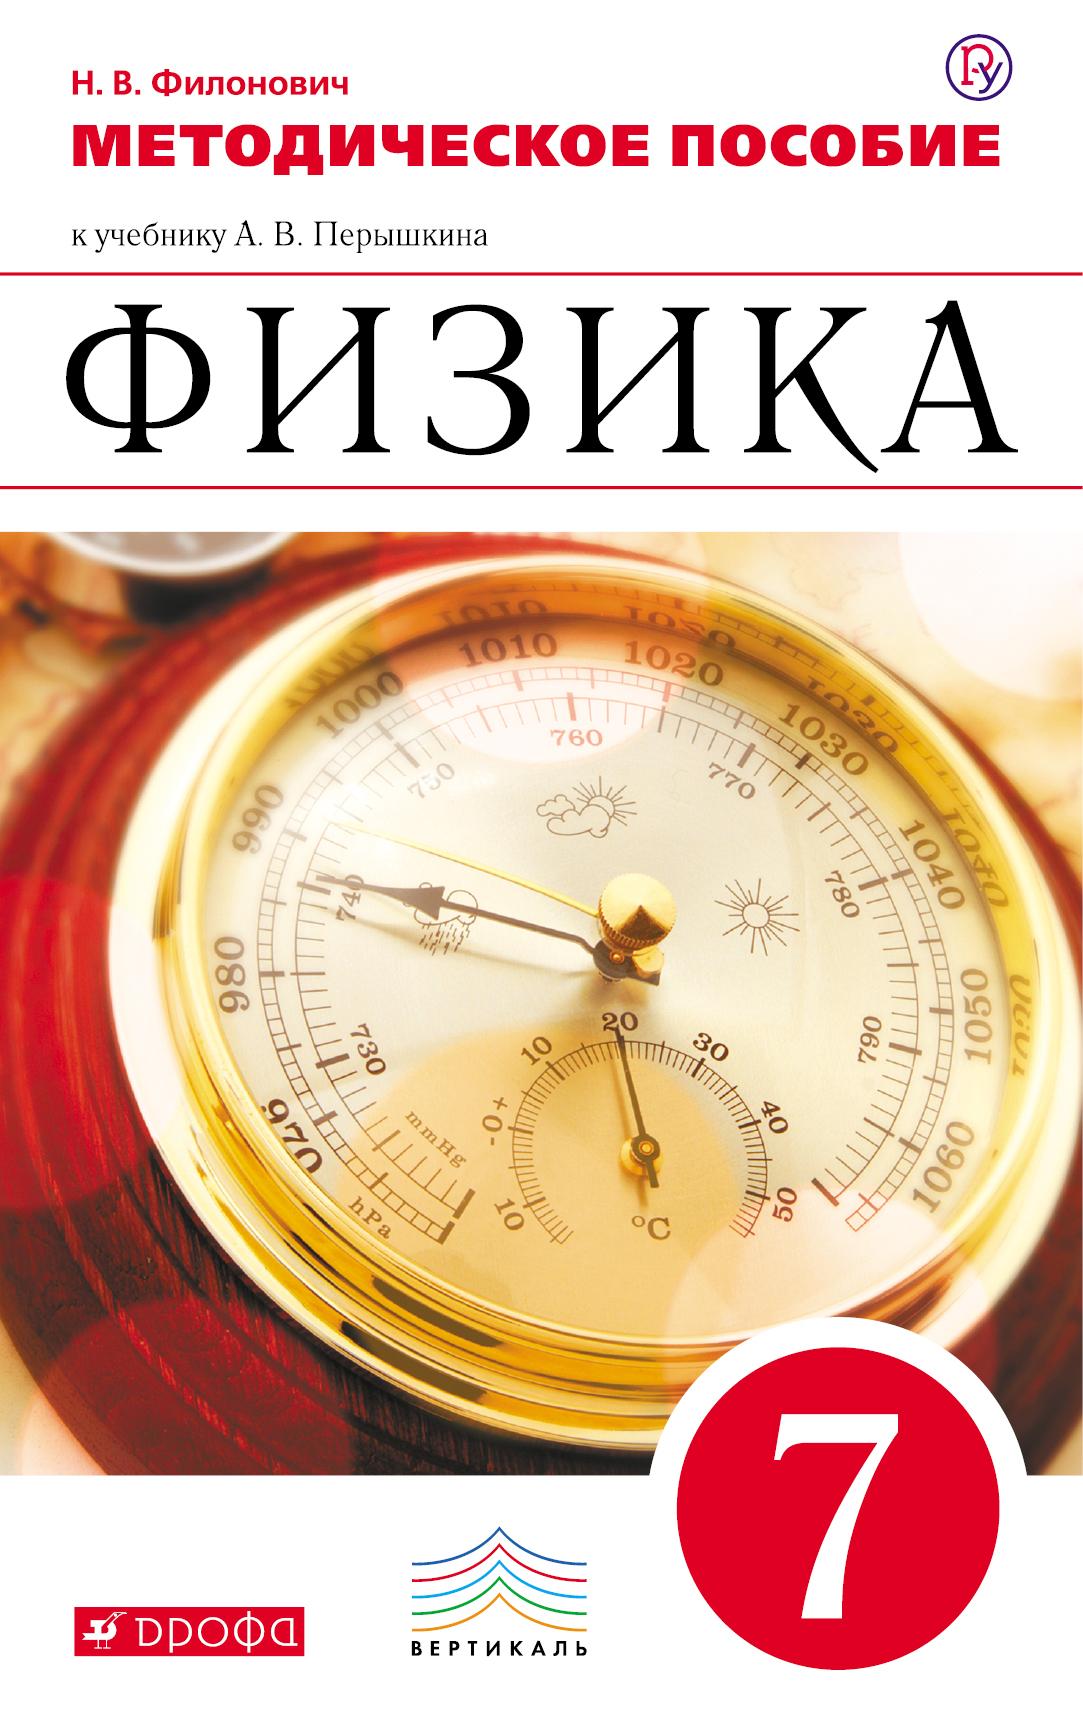 Филонович Н.В. Физика. 7 класс. Методическое пособие. филонович н в физика 7 класс методическое пособие